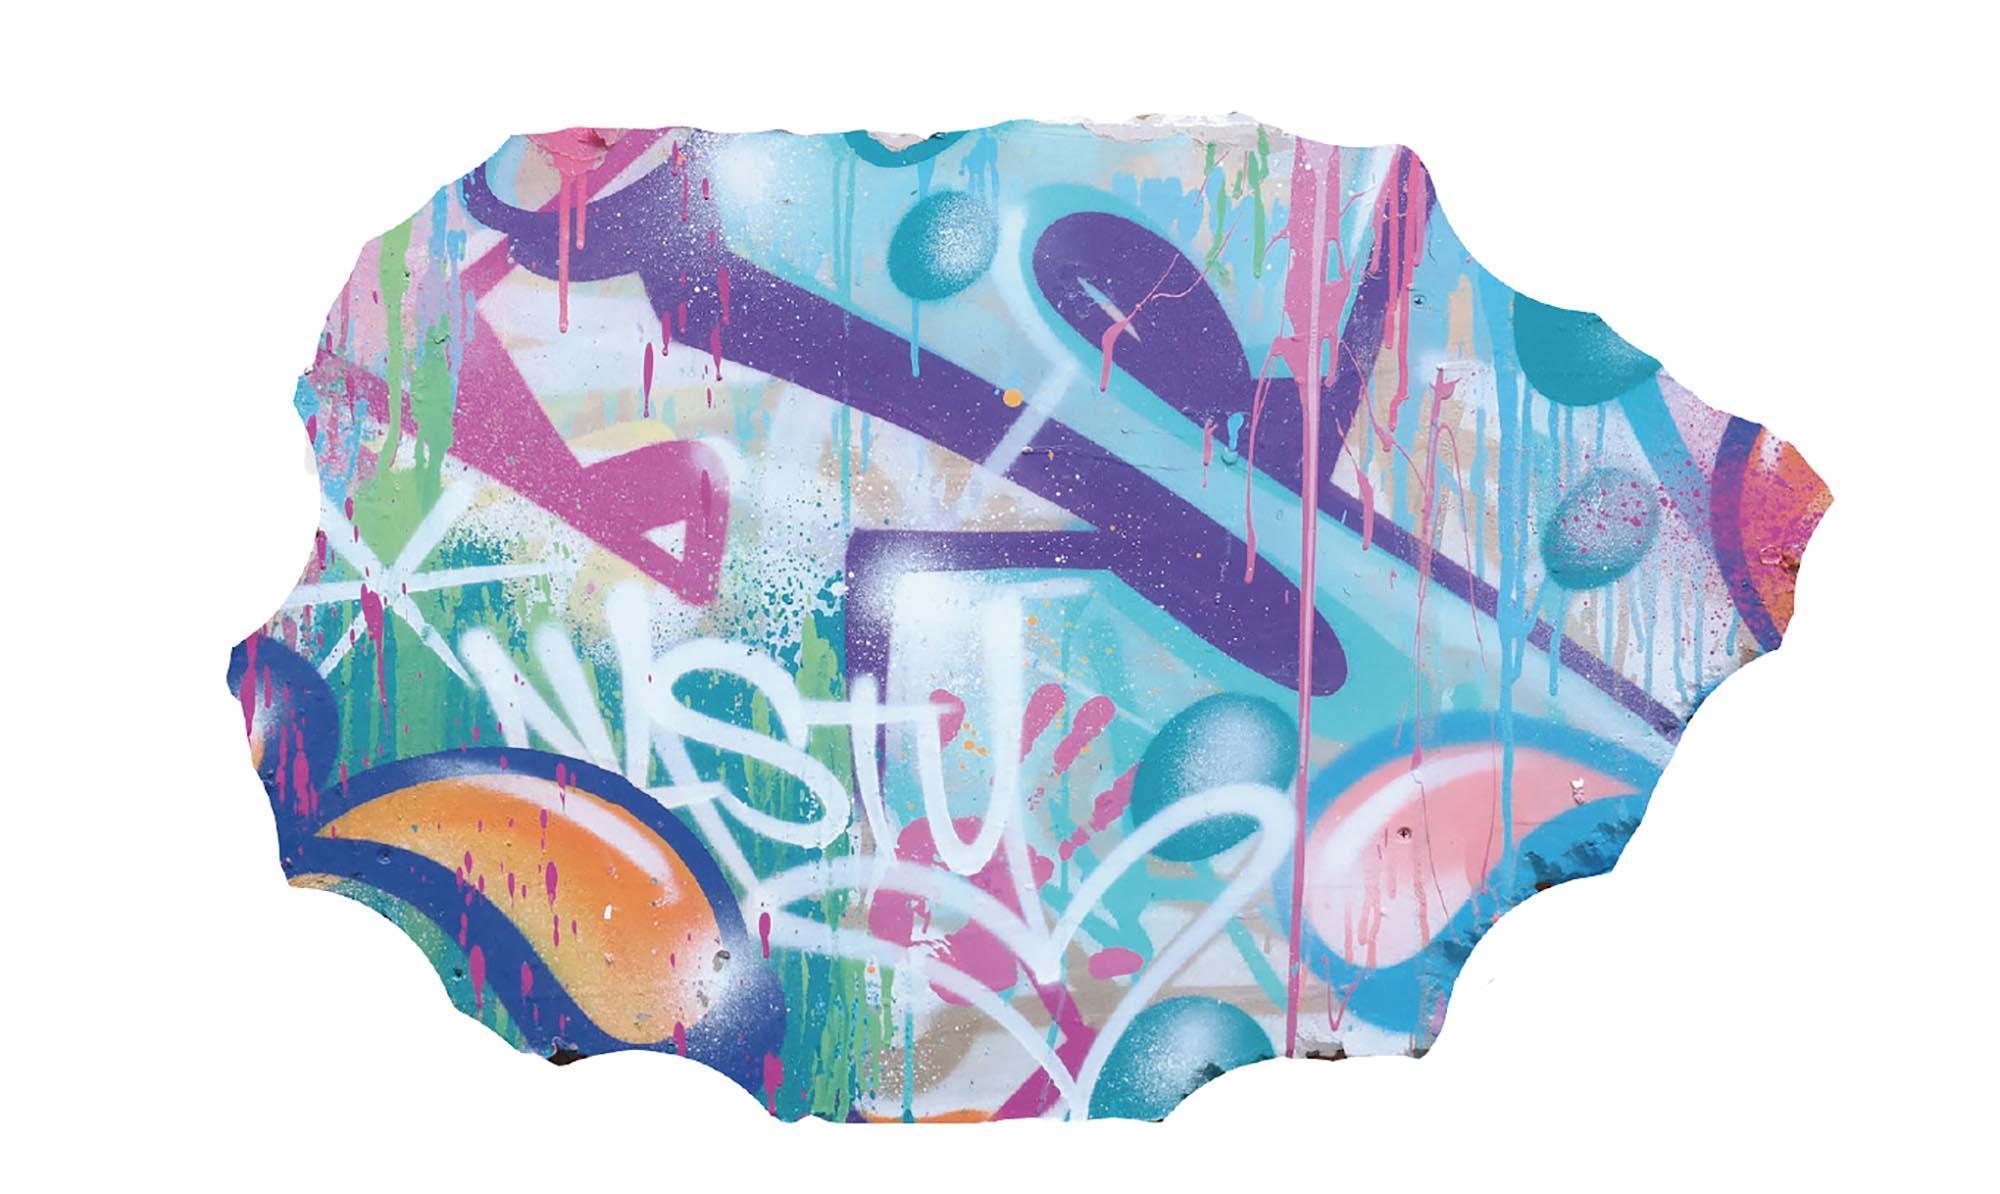 Street Fragment 1 by   Nasty - Masterpiece Online